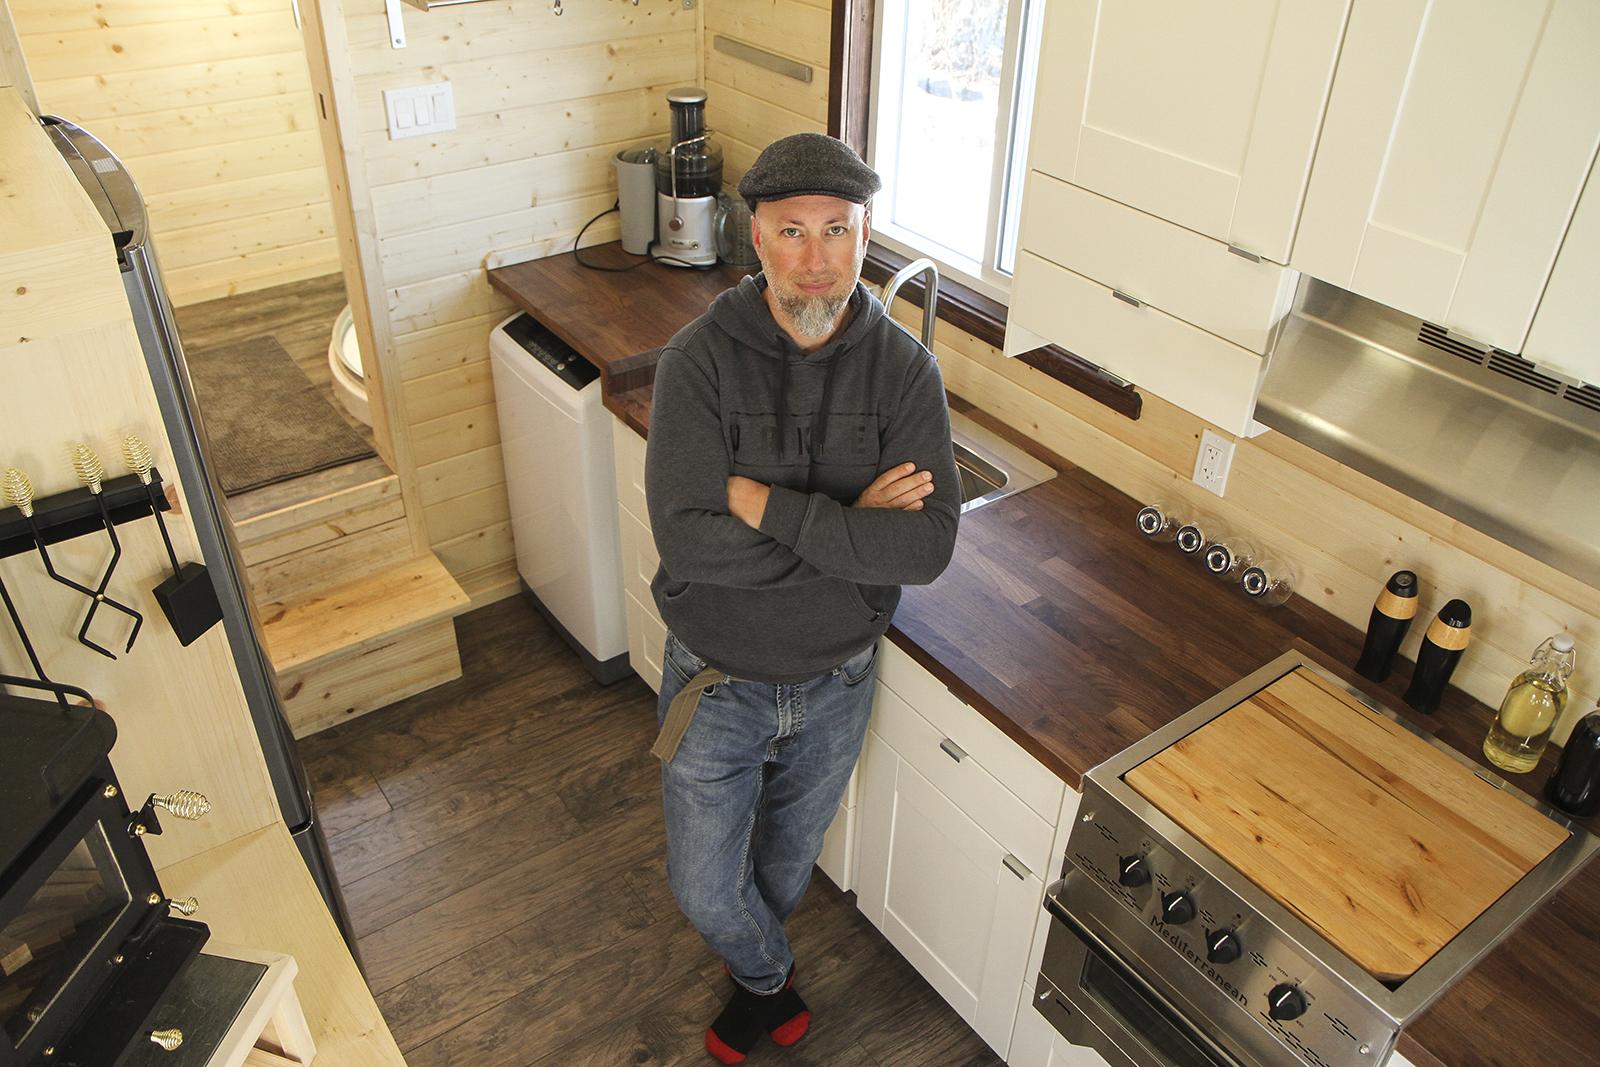 Black Bird Tiny Homes Owner l tiny houses for sale l Tiny Life Supply.jpg